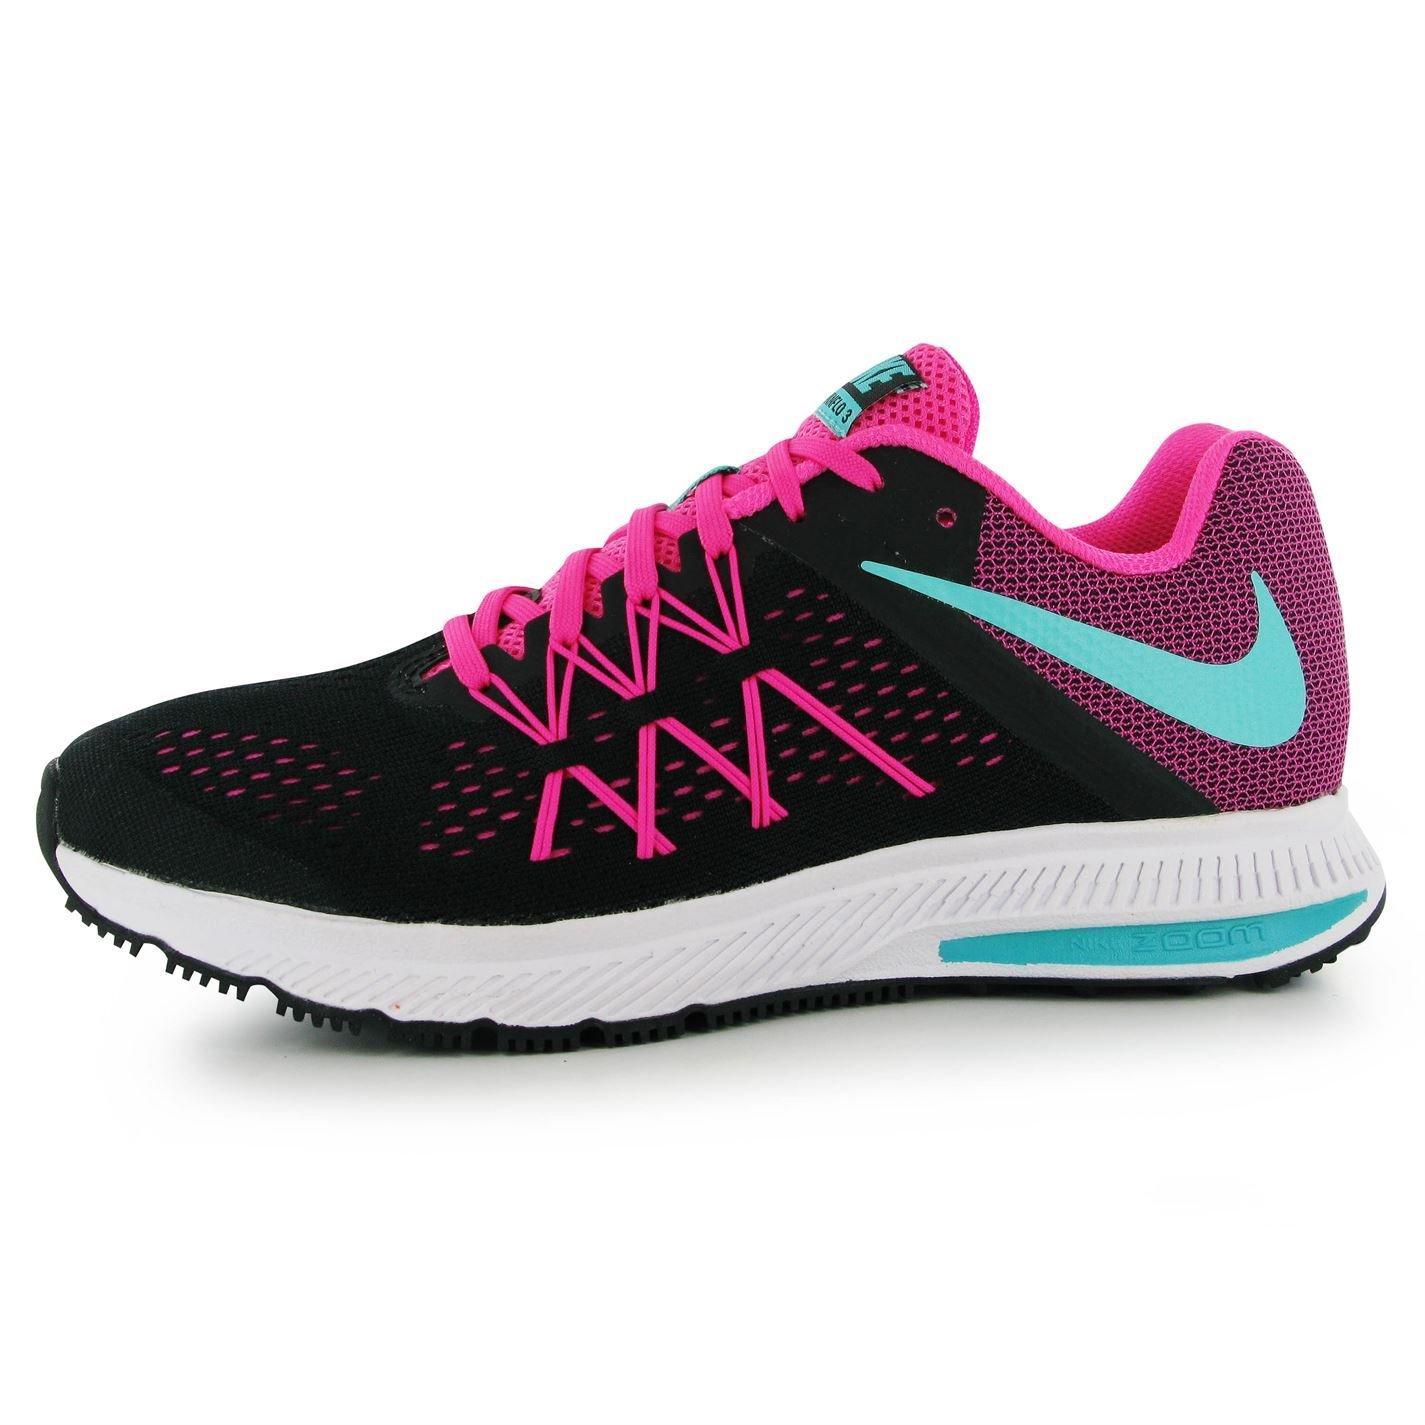 59152a14670c Nike Zoom Winflo 3 Running Shoes Womens Black Green Pink Run Trainers  Sneakers (UK6.5) (EU40.5) (US9)  Amazon.co.uk  Sports   Outdoors